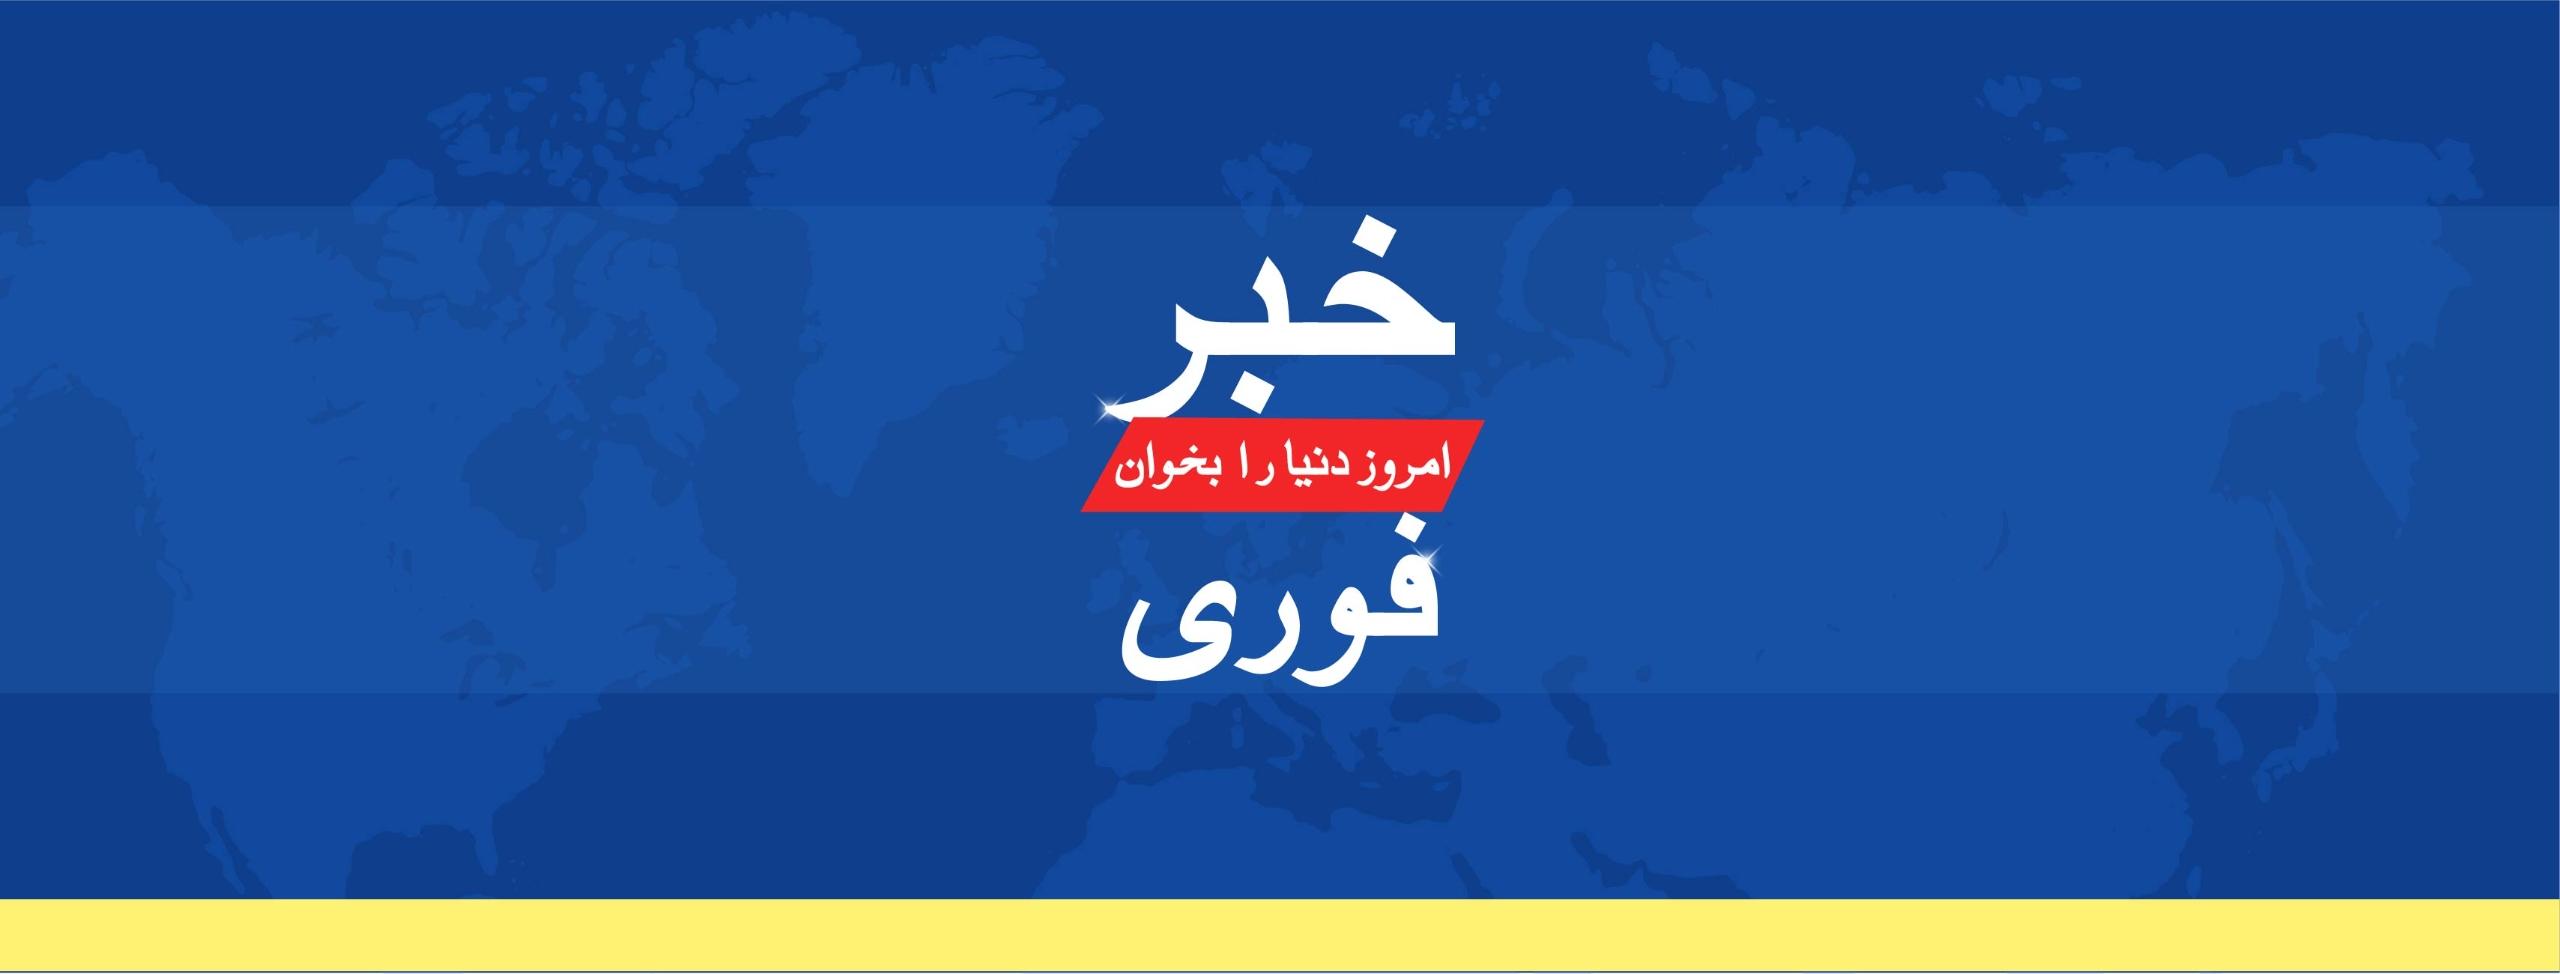 Edalat News (@edalatnews) Cover Image